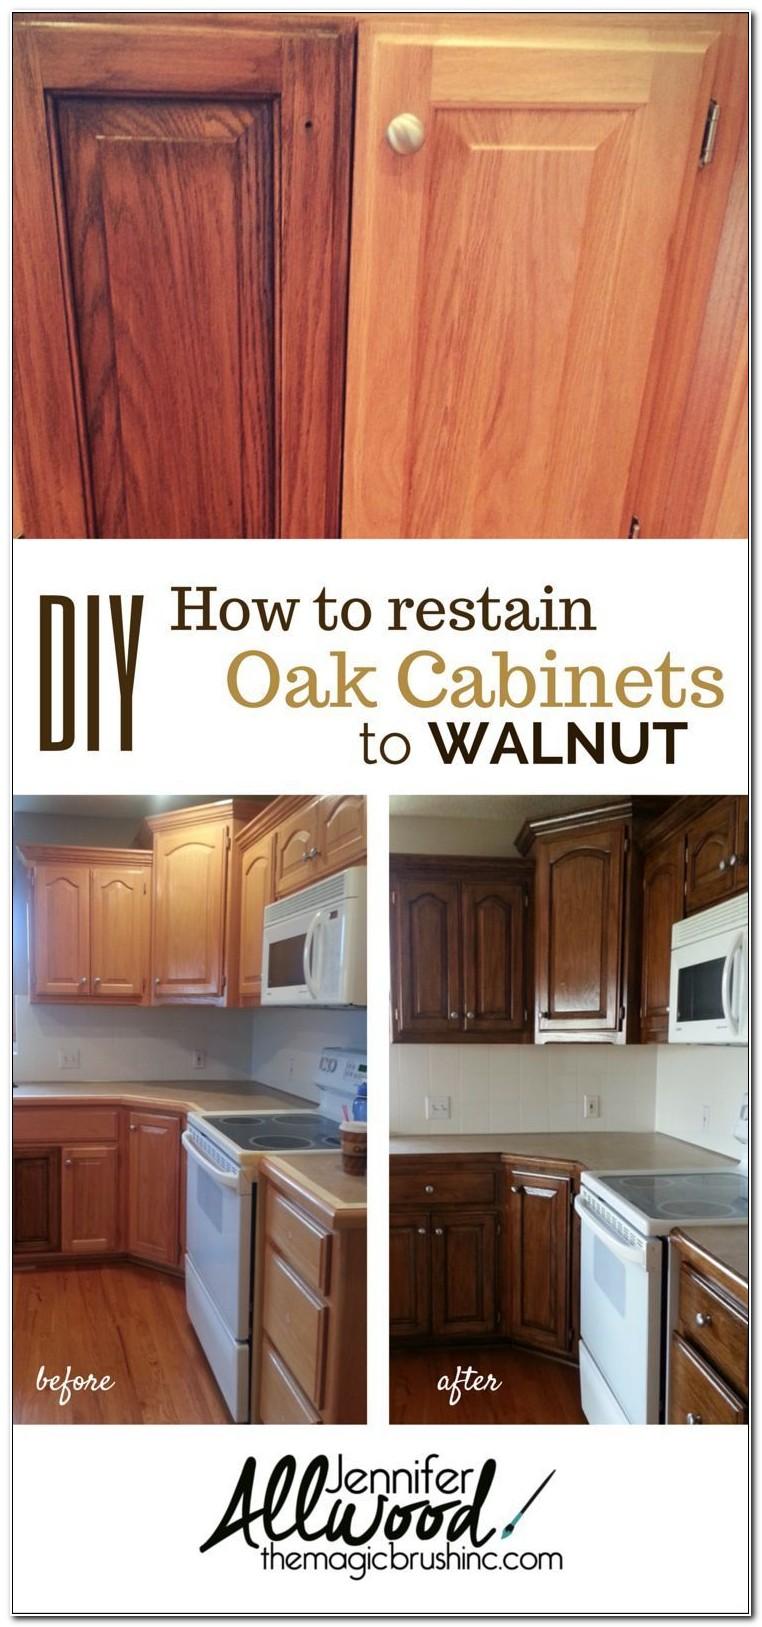 Refinish Oak Kitchen Cabinets Yourself